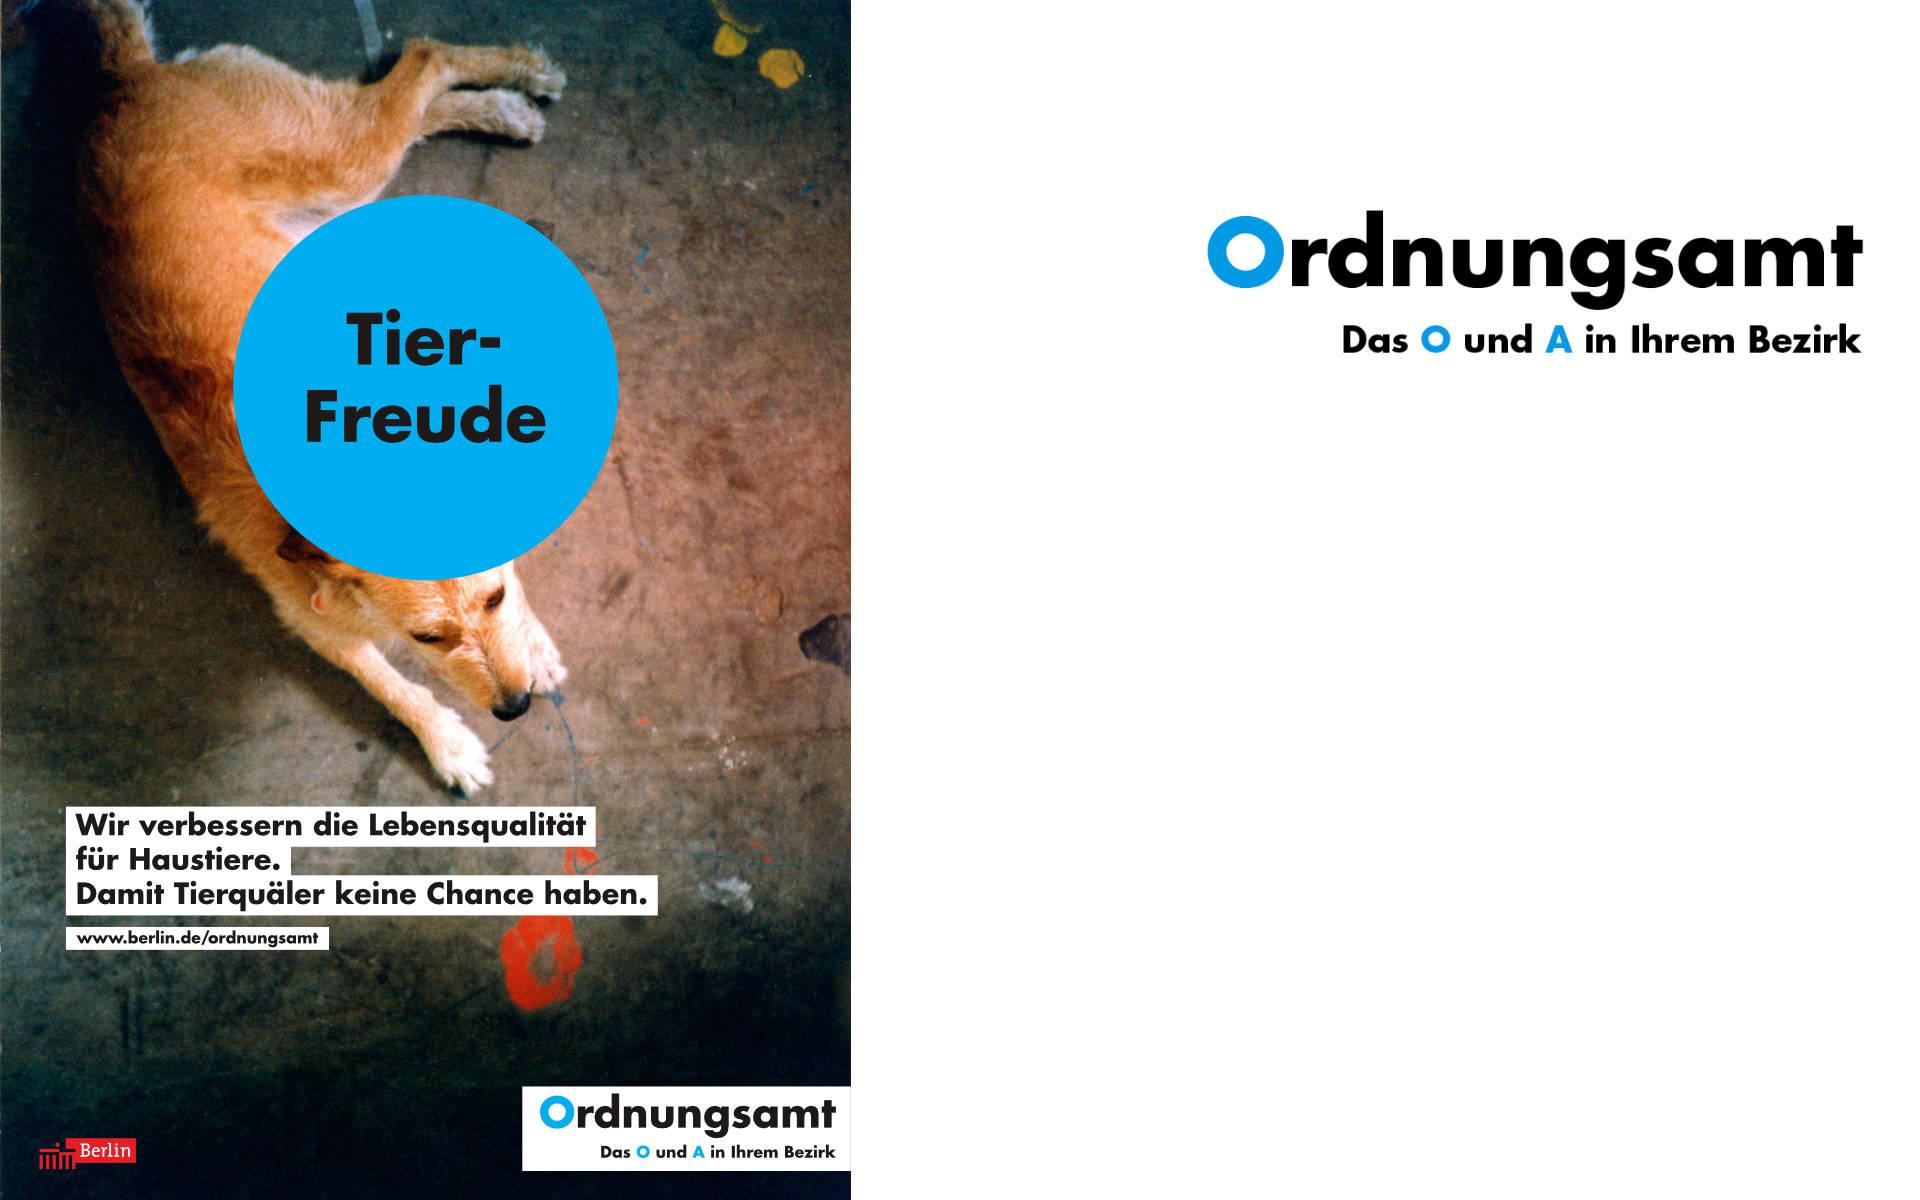 Ordnungsamt Plakat Kampagne Design